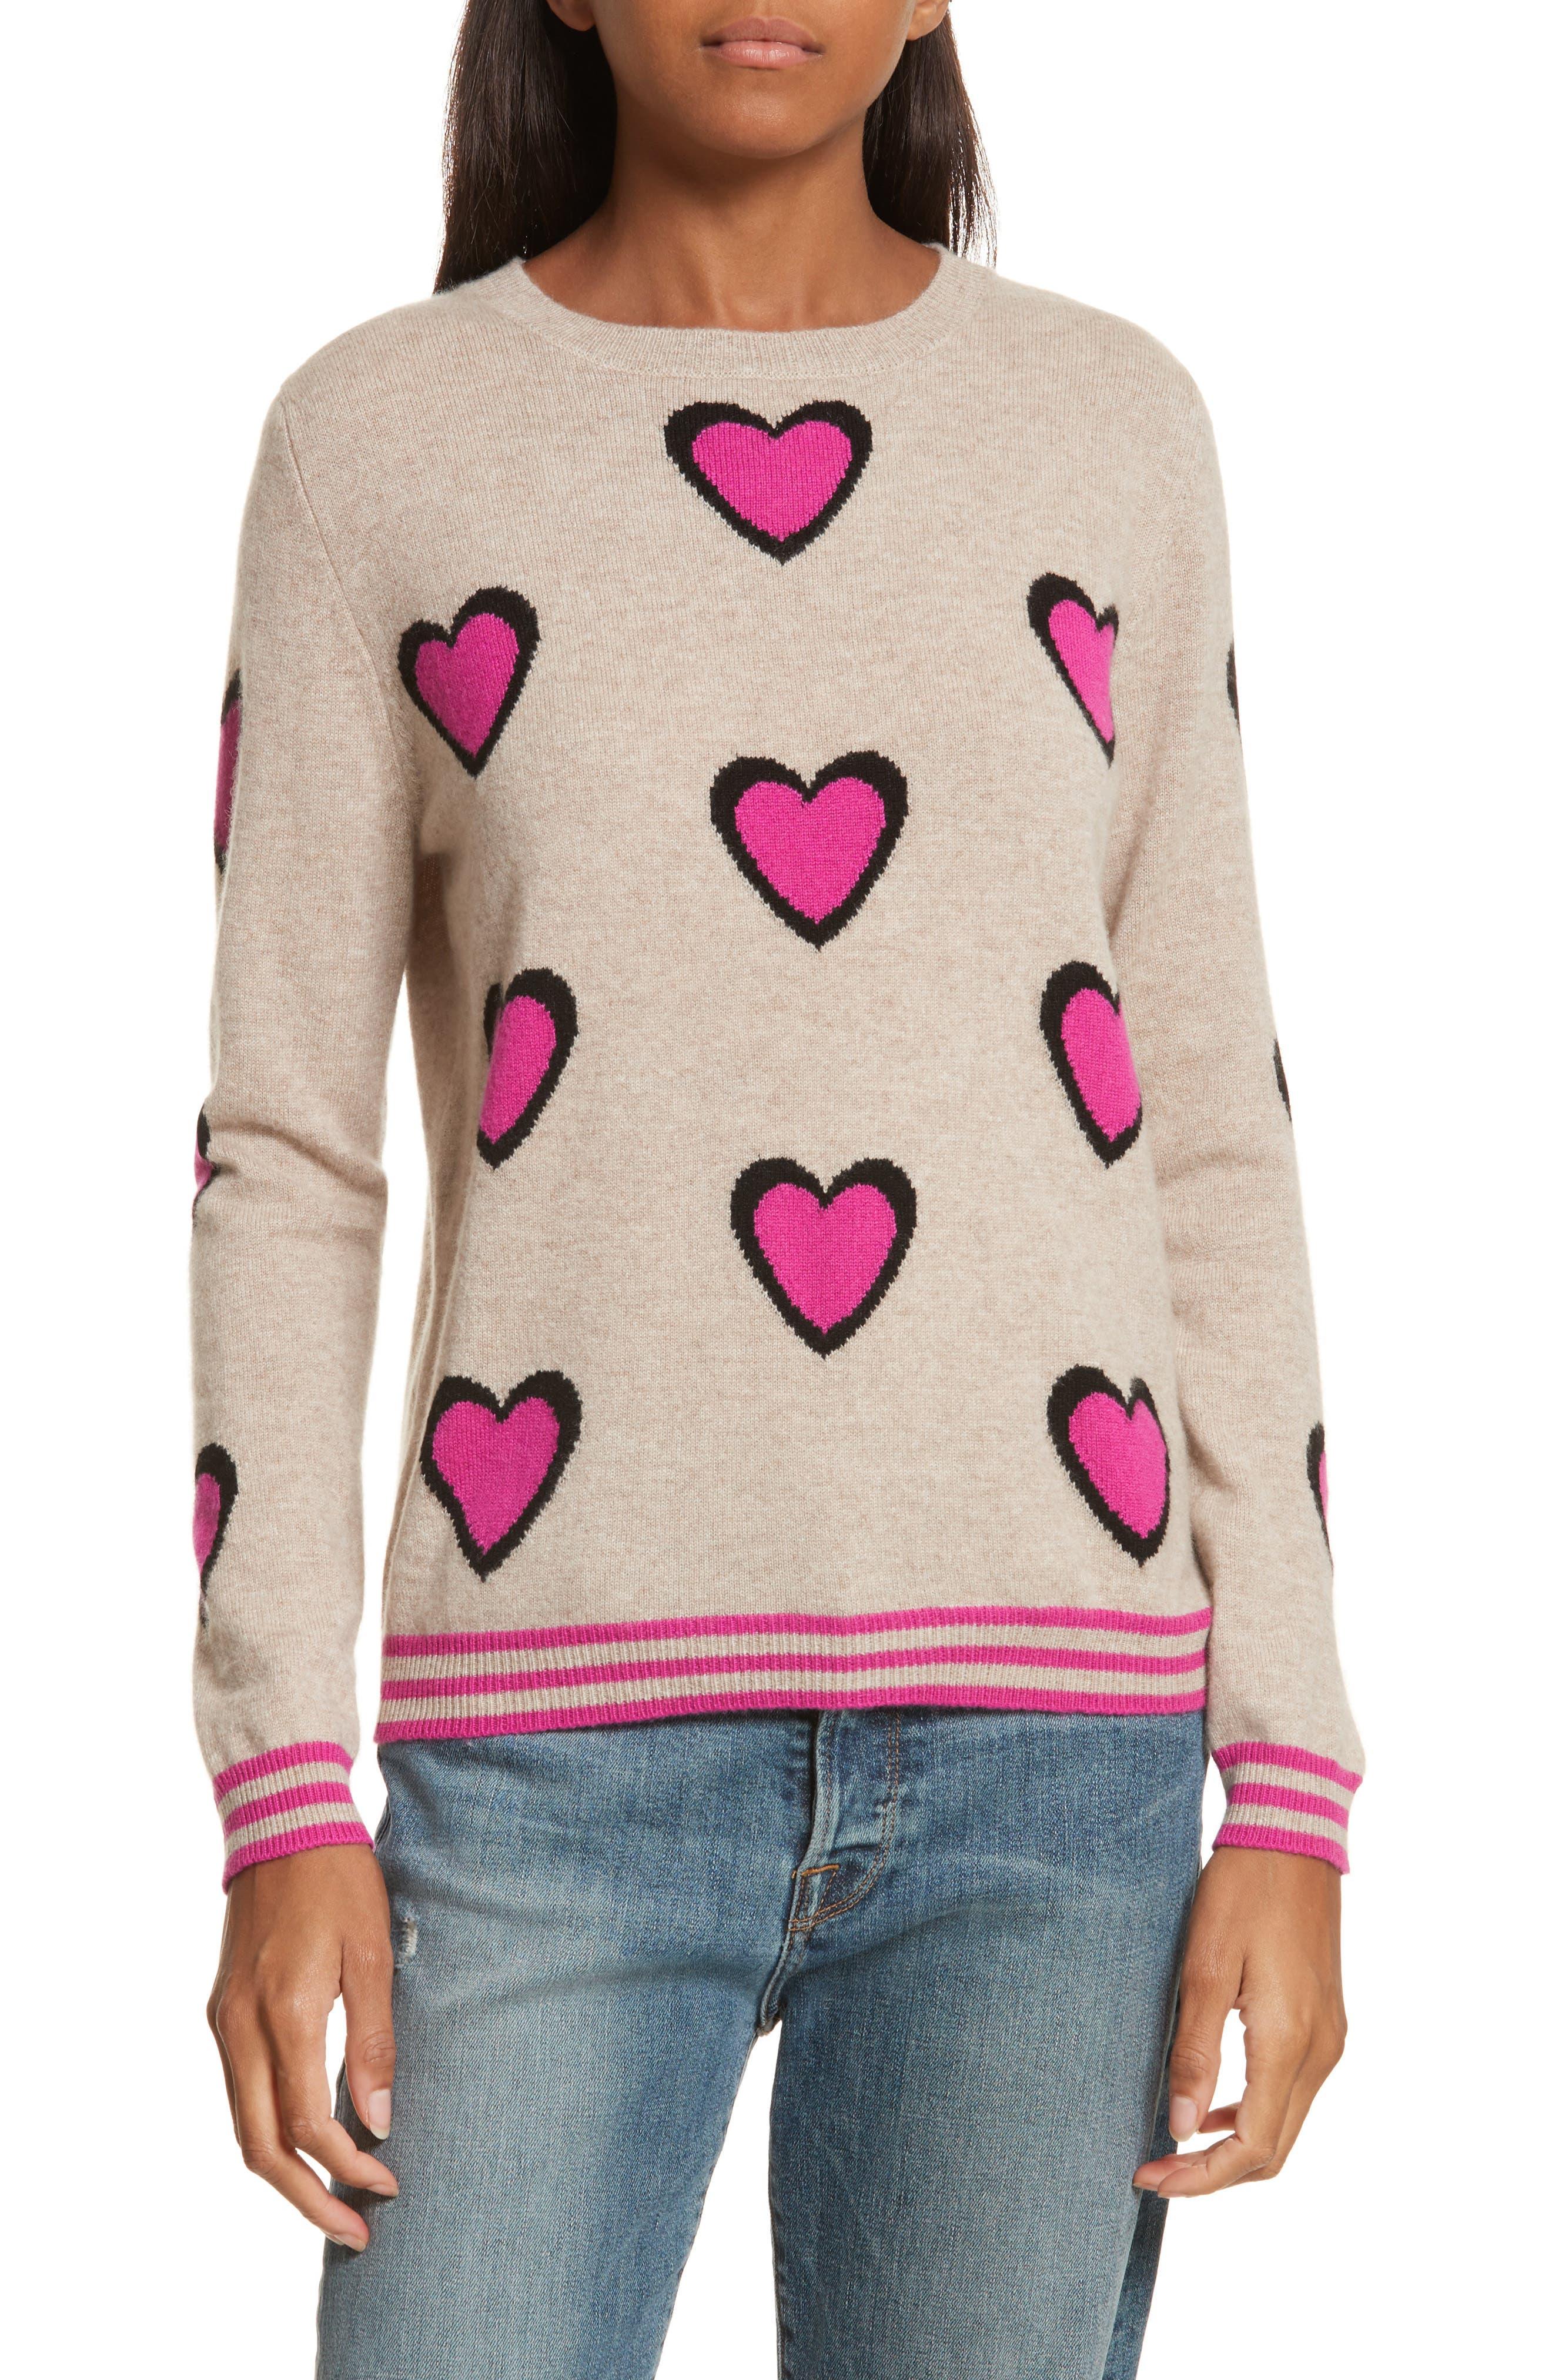 CHINTI & PARKER Heart Burst Cashmere Sweater,                         Main,                         color, Oatmeal/ Black/ Fuchsia